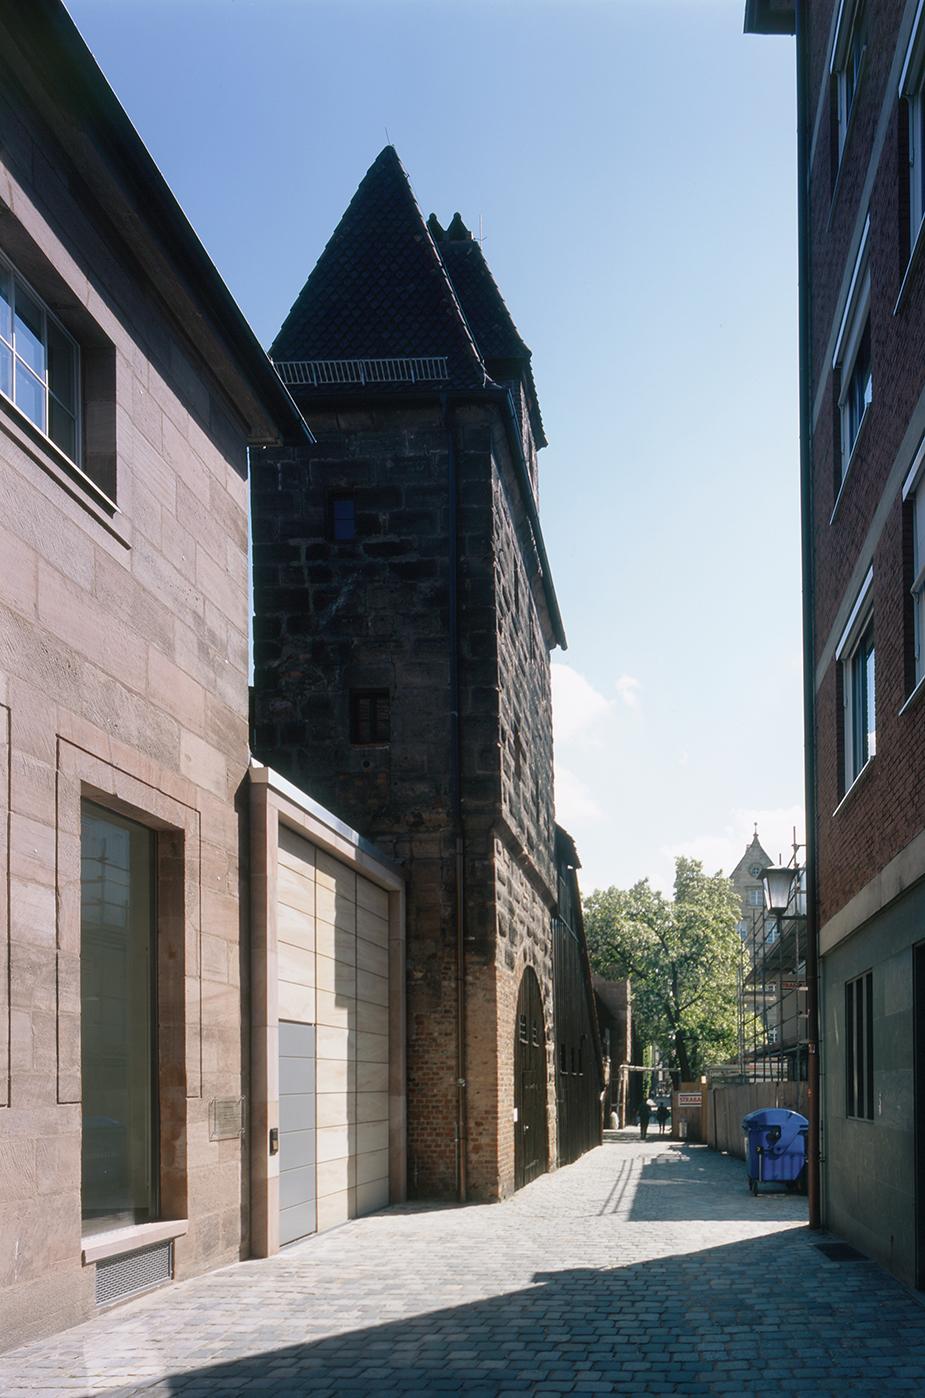 Kunsthalle Nürnberg Gasse